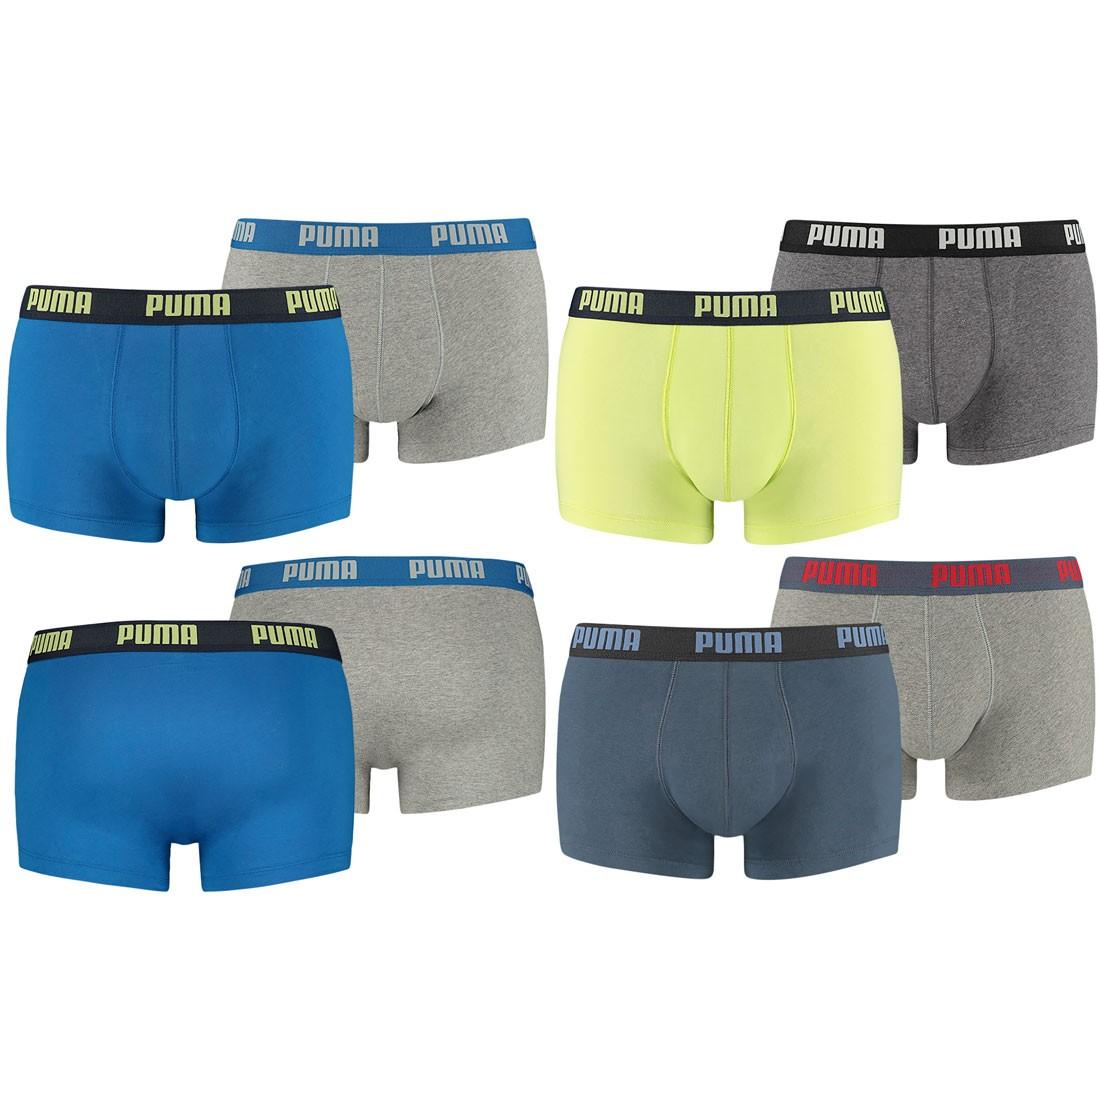 PUMA Herren Boxershorts, 4er Pack Trunks – Bild 1